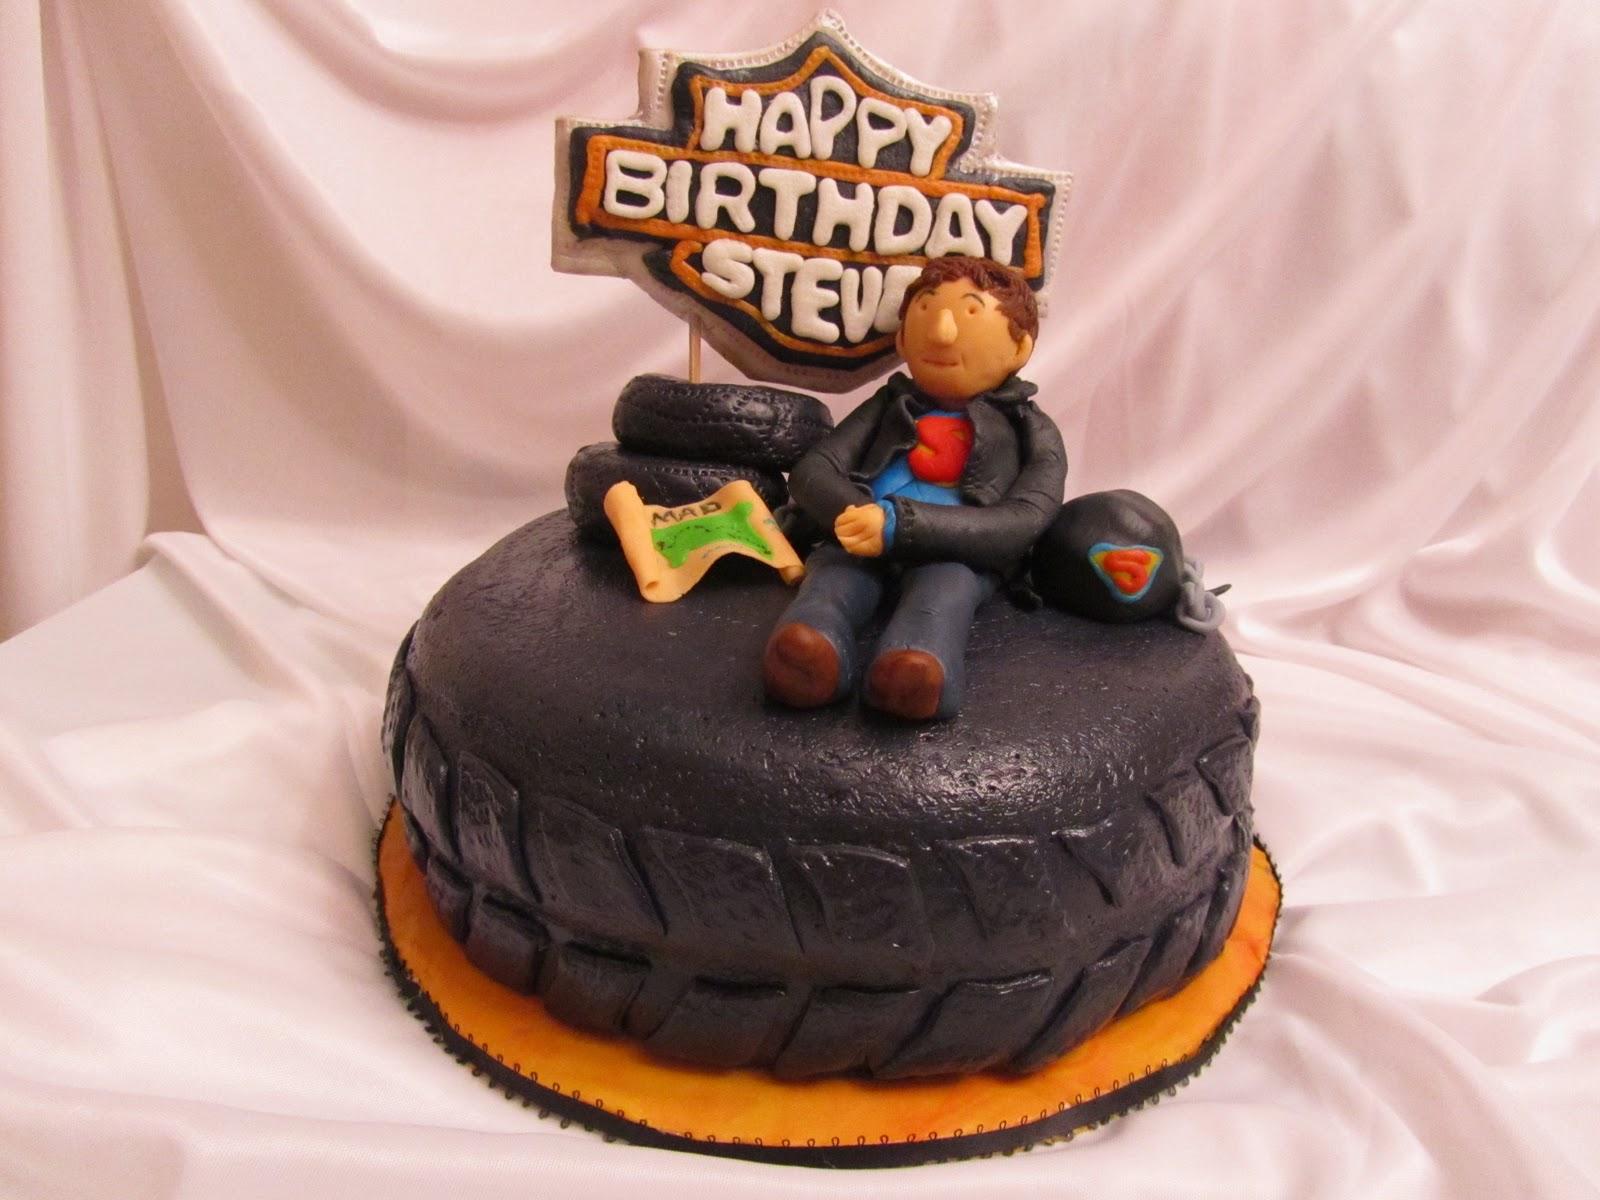 Divine Delicacies Superman And Harley Davidson Cake